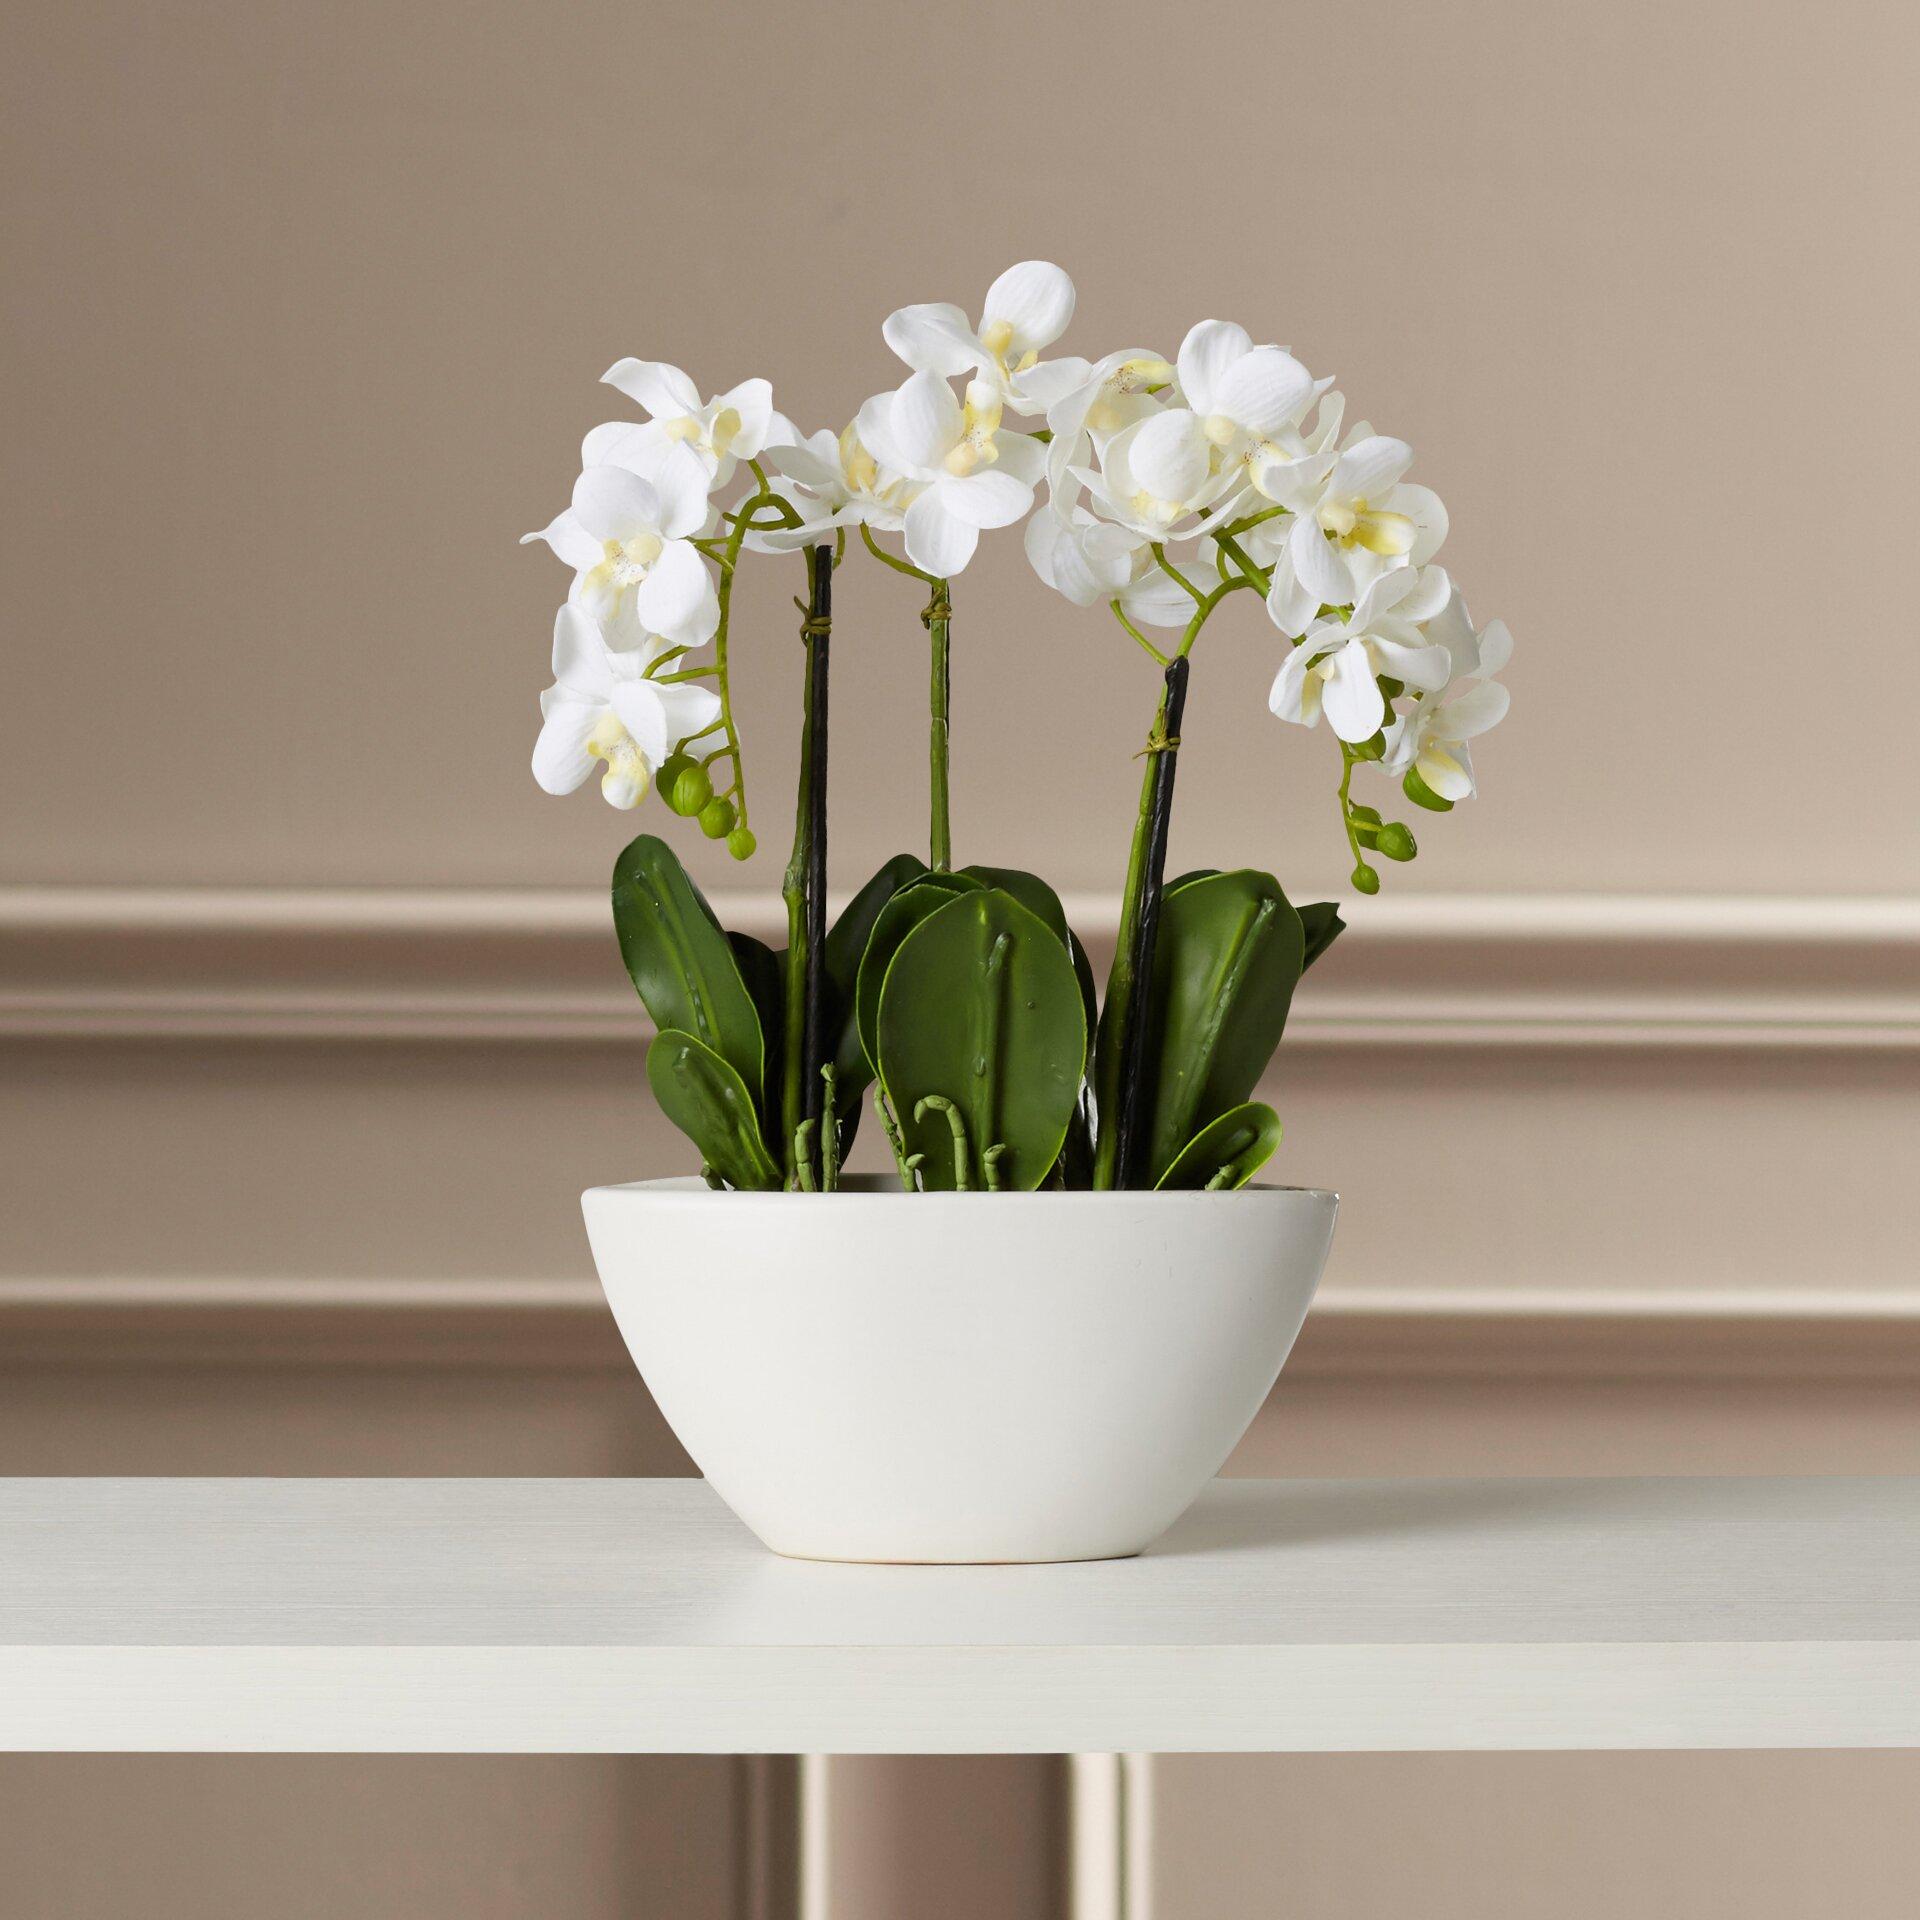 Flower Pots With Artificial Flowers Lorelei Phalaenopsis Silk Flowers Hohn